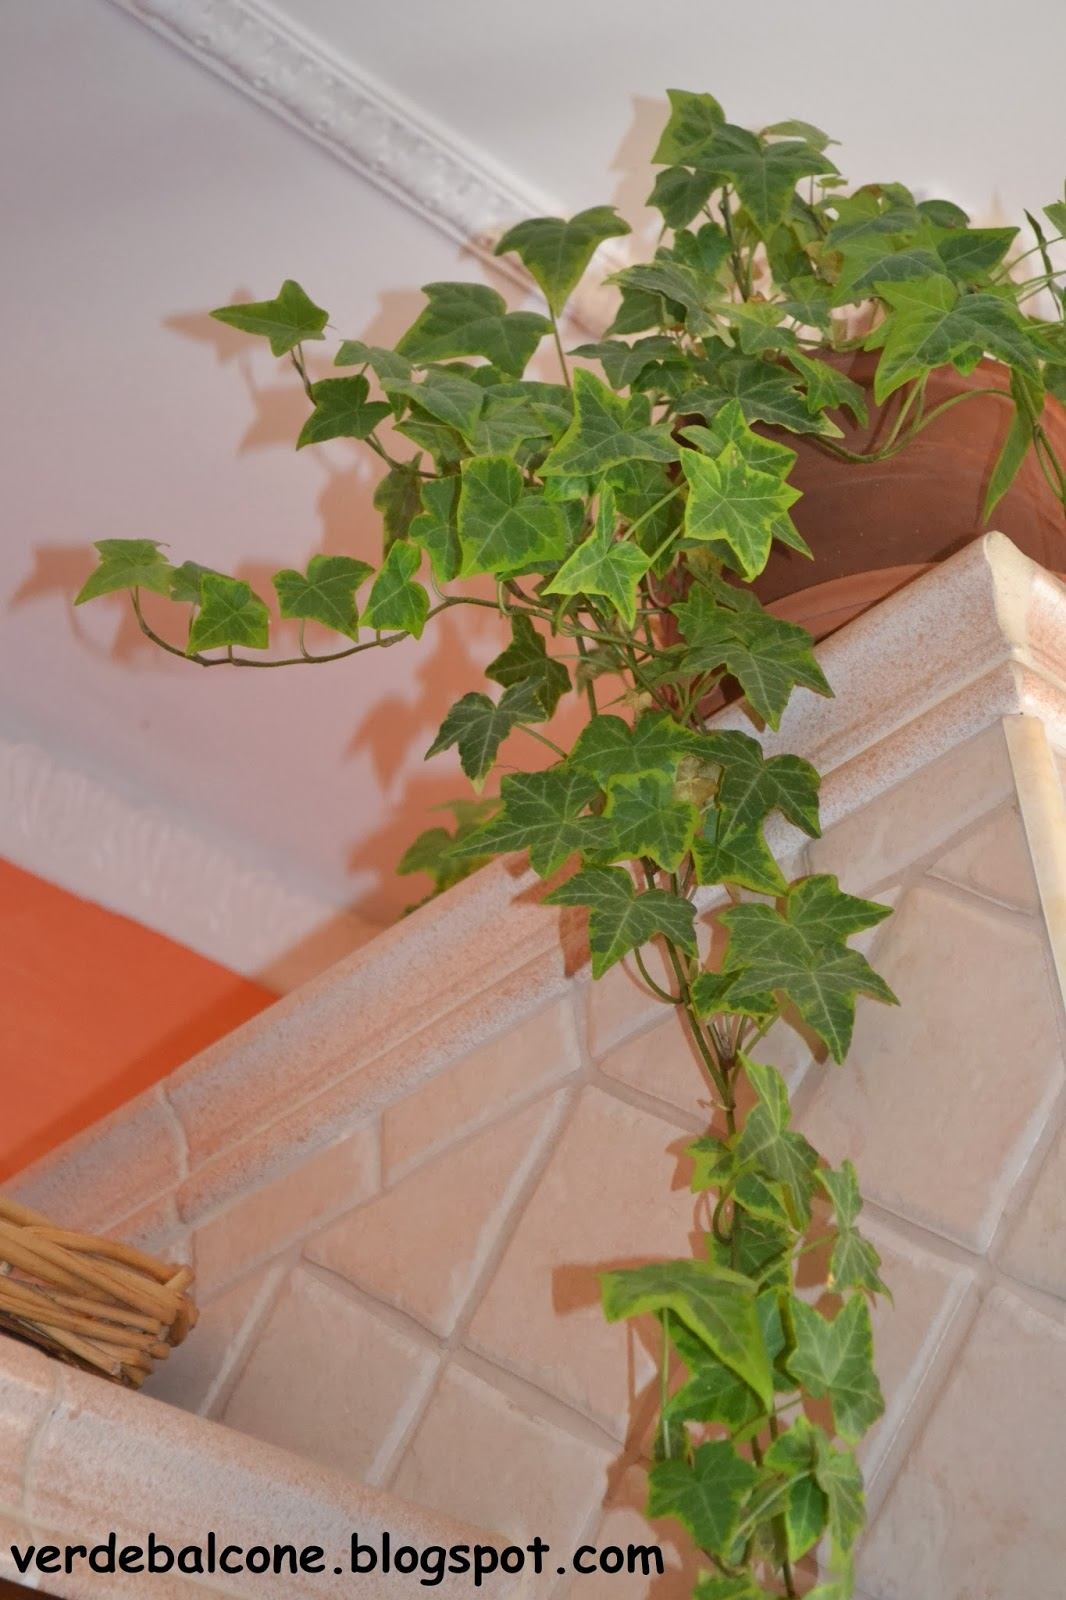 Verde balcone edera regina degli interni for Talea edera